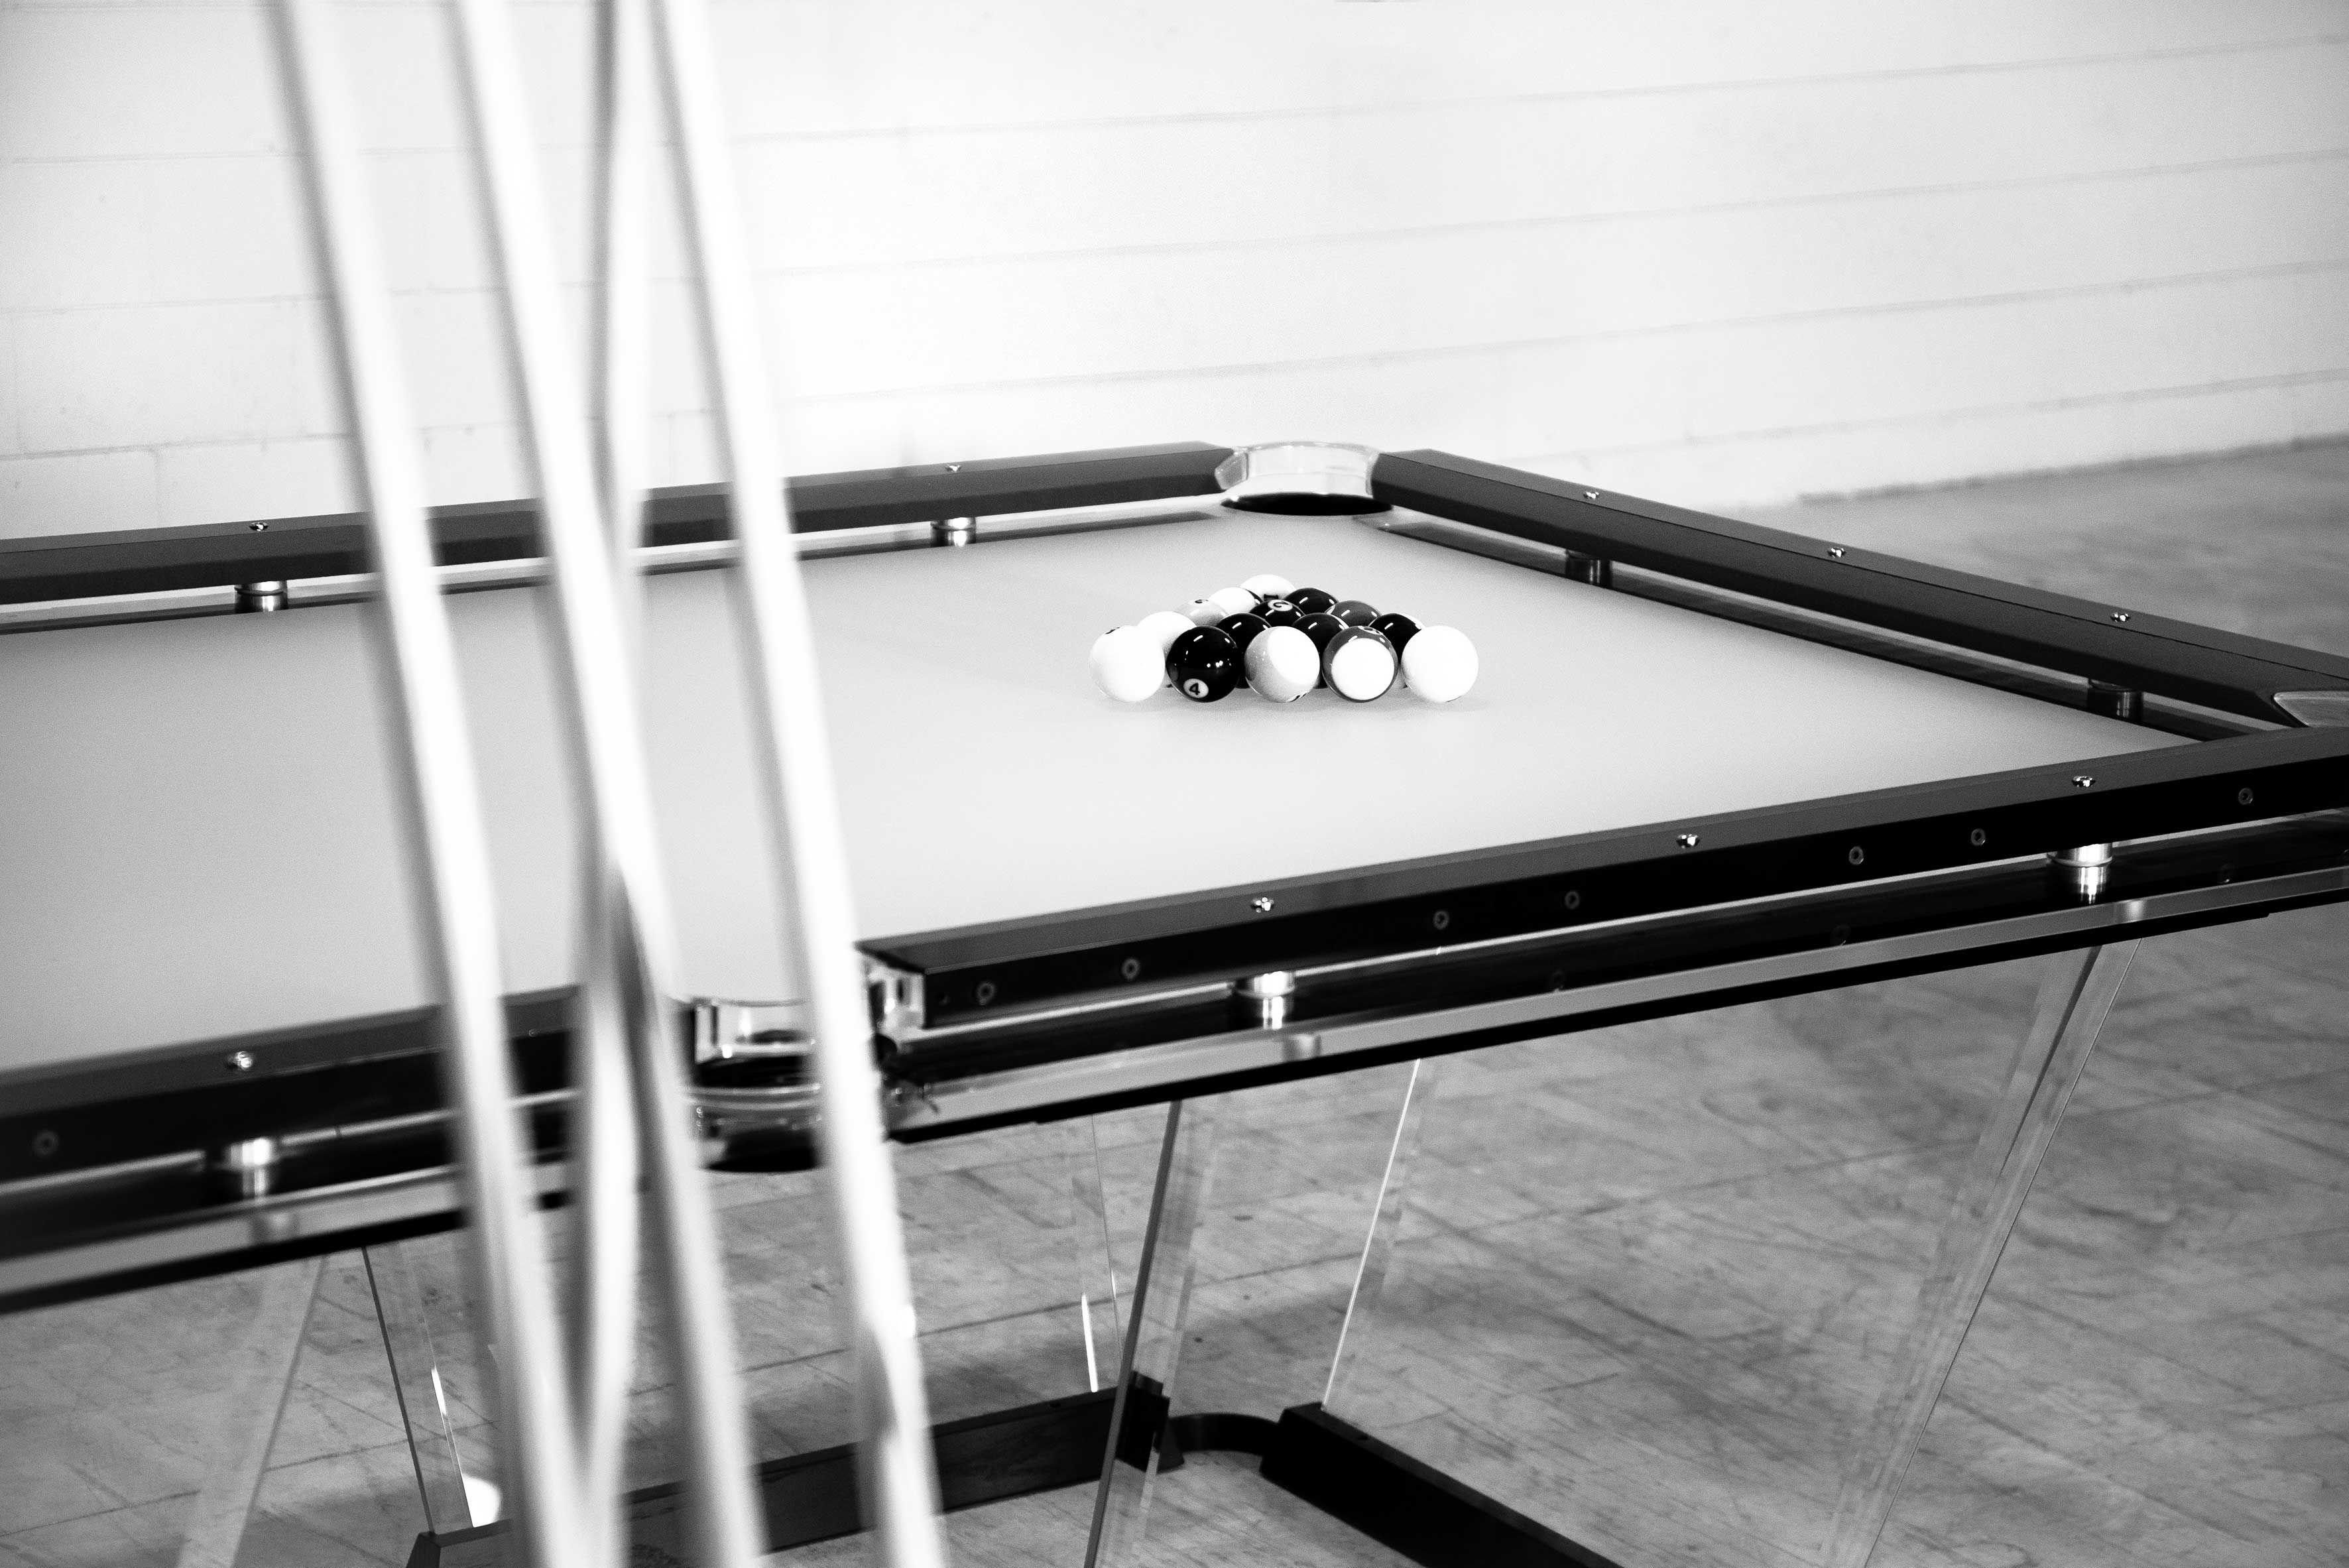 Teckell Pool Table in 2020 Pool table, Infinity table